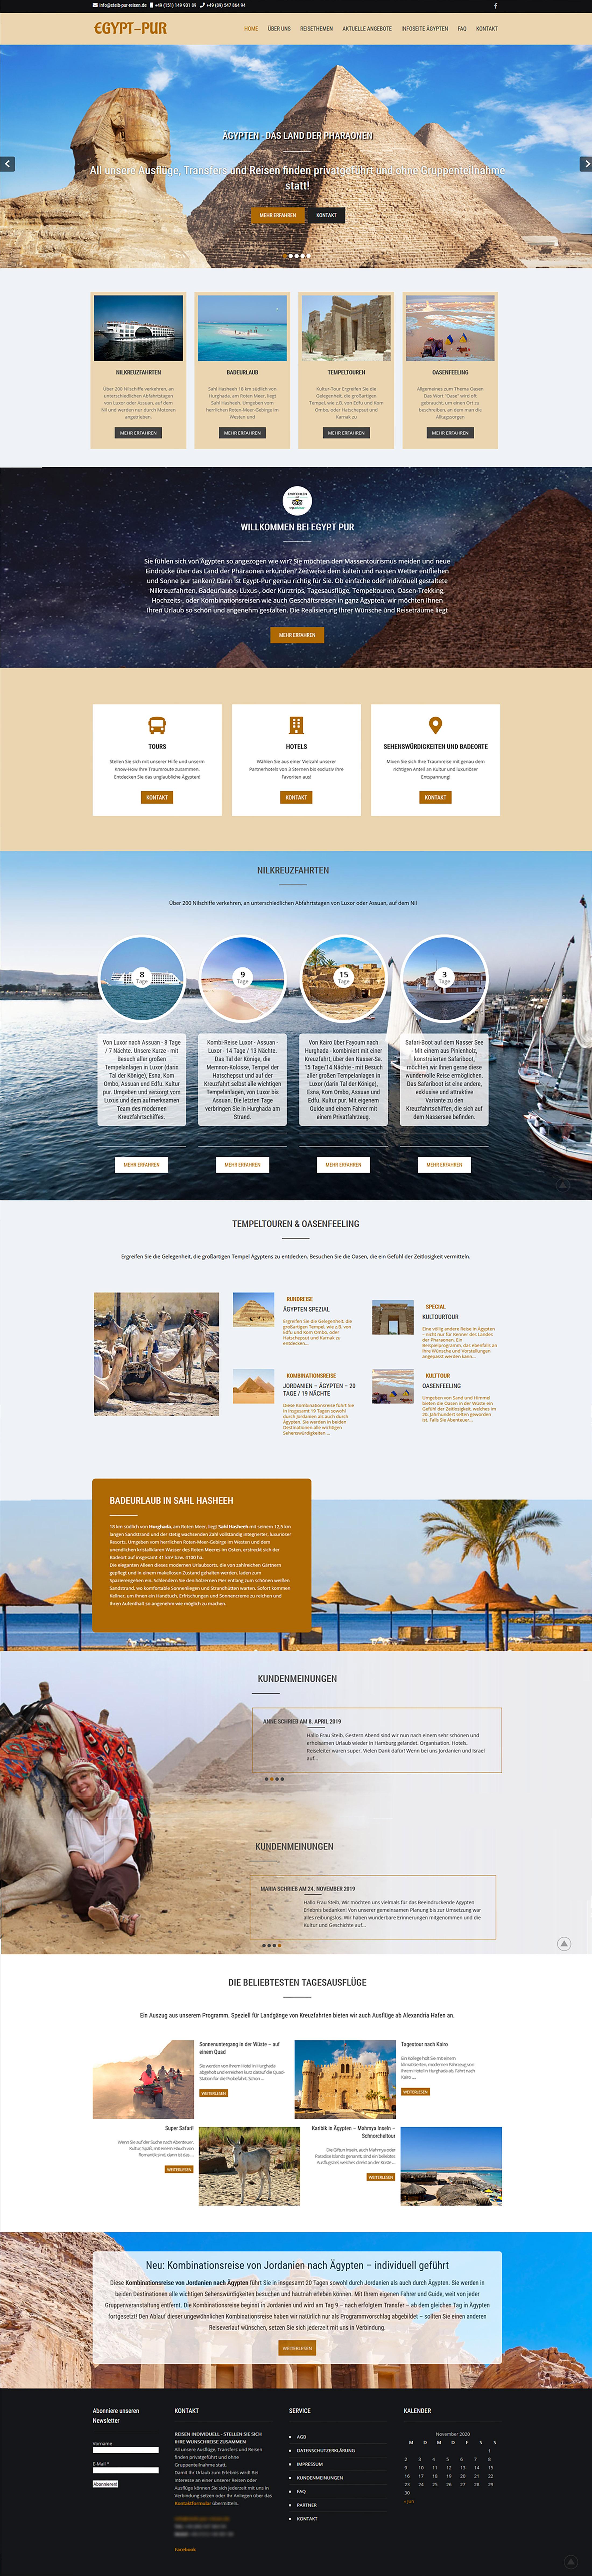 egypt-pur -2- design-meets-web-web-grafik-print-werbetechnik-muenchen-markt schwaben